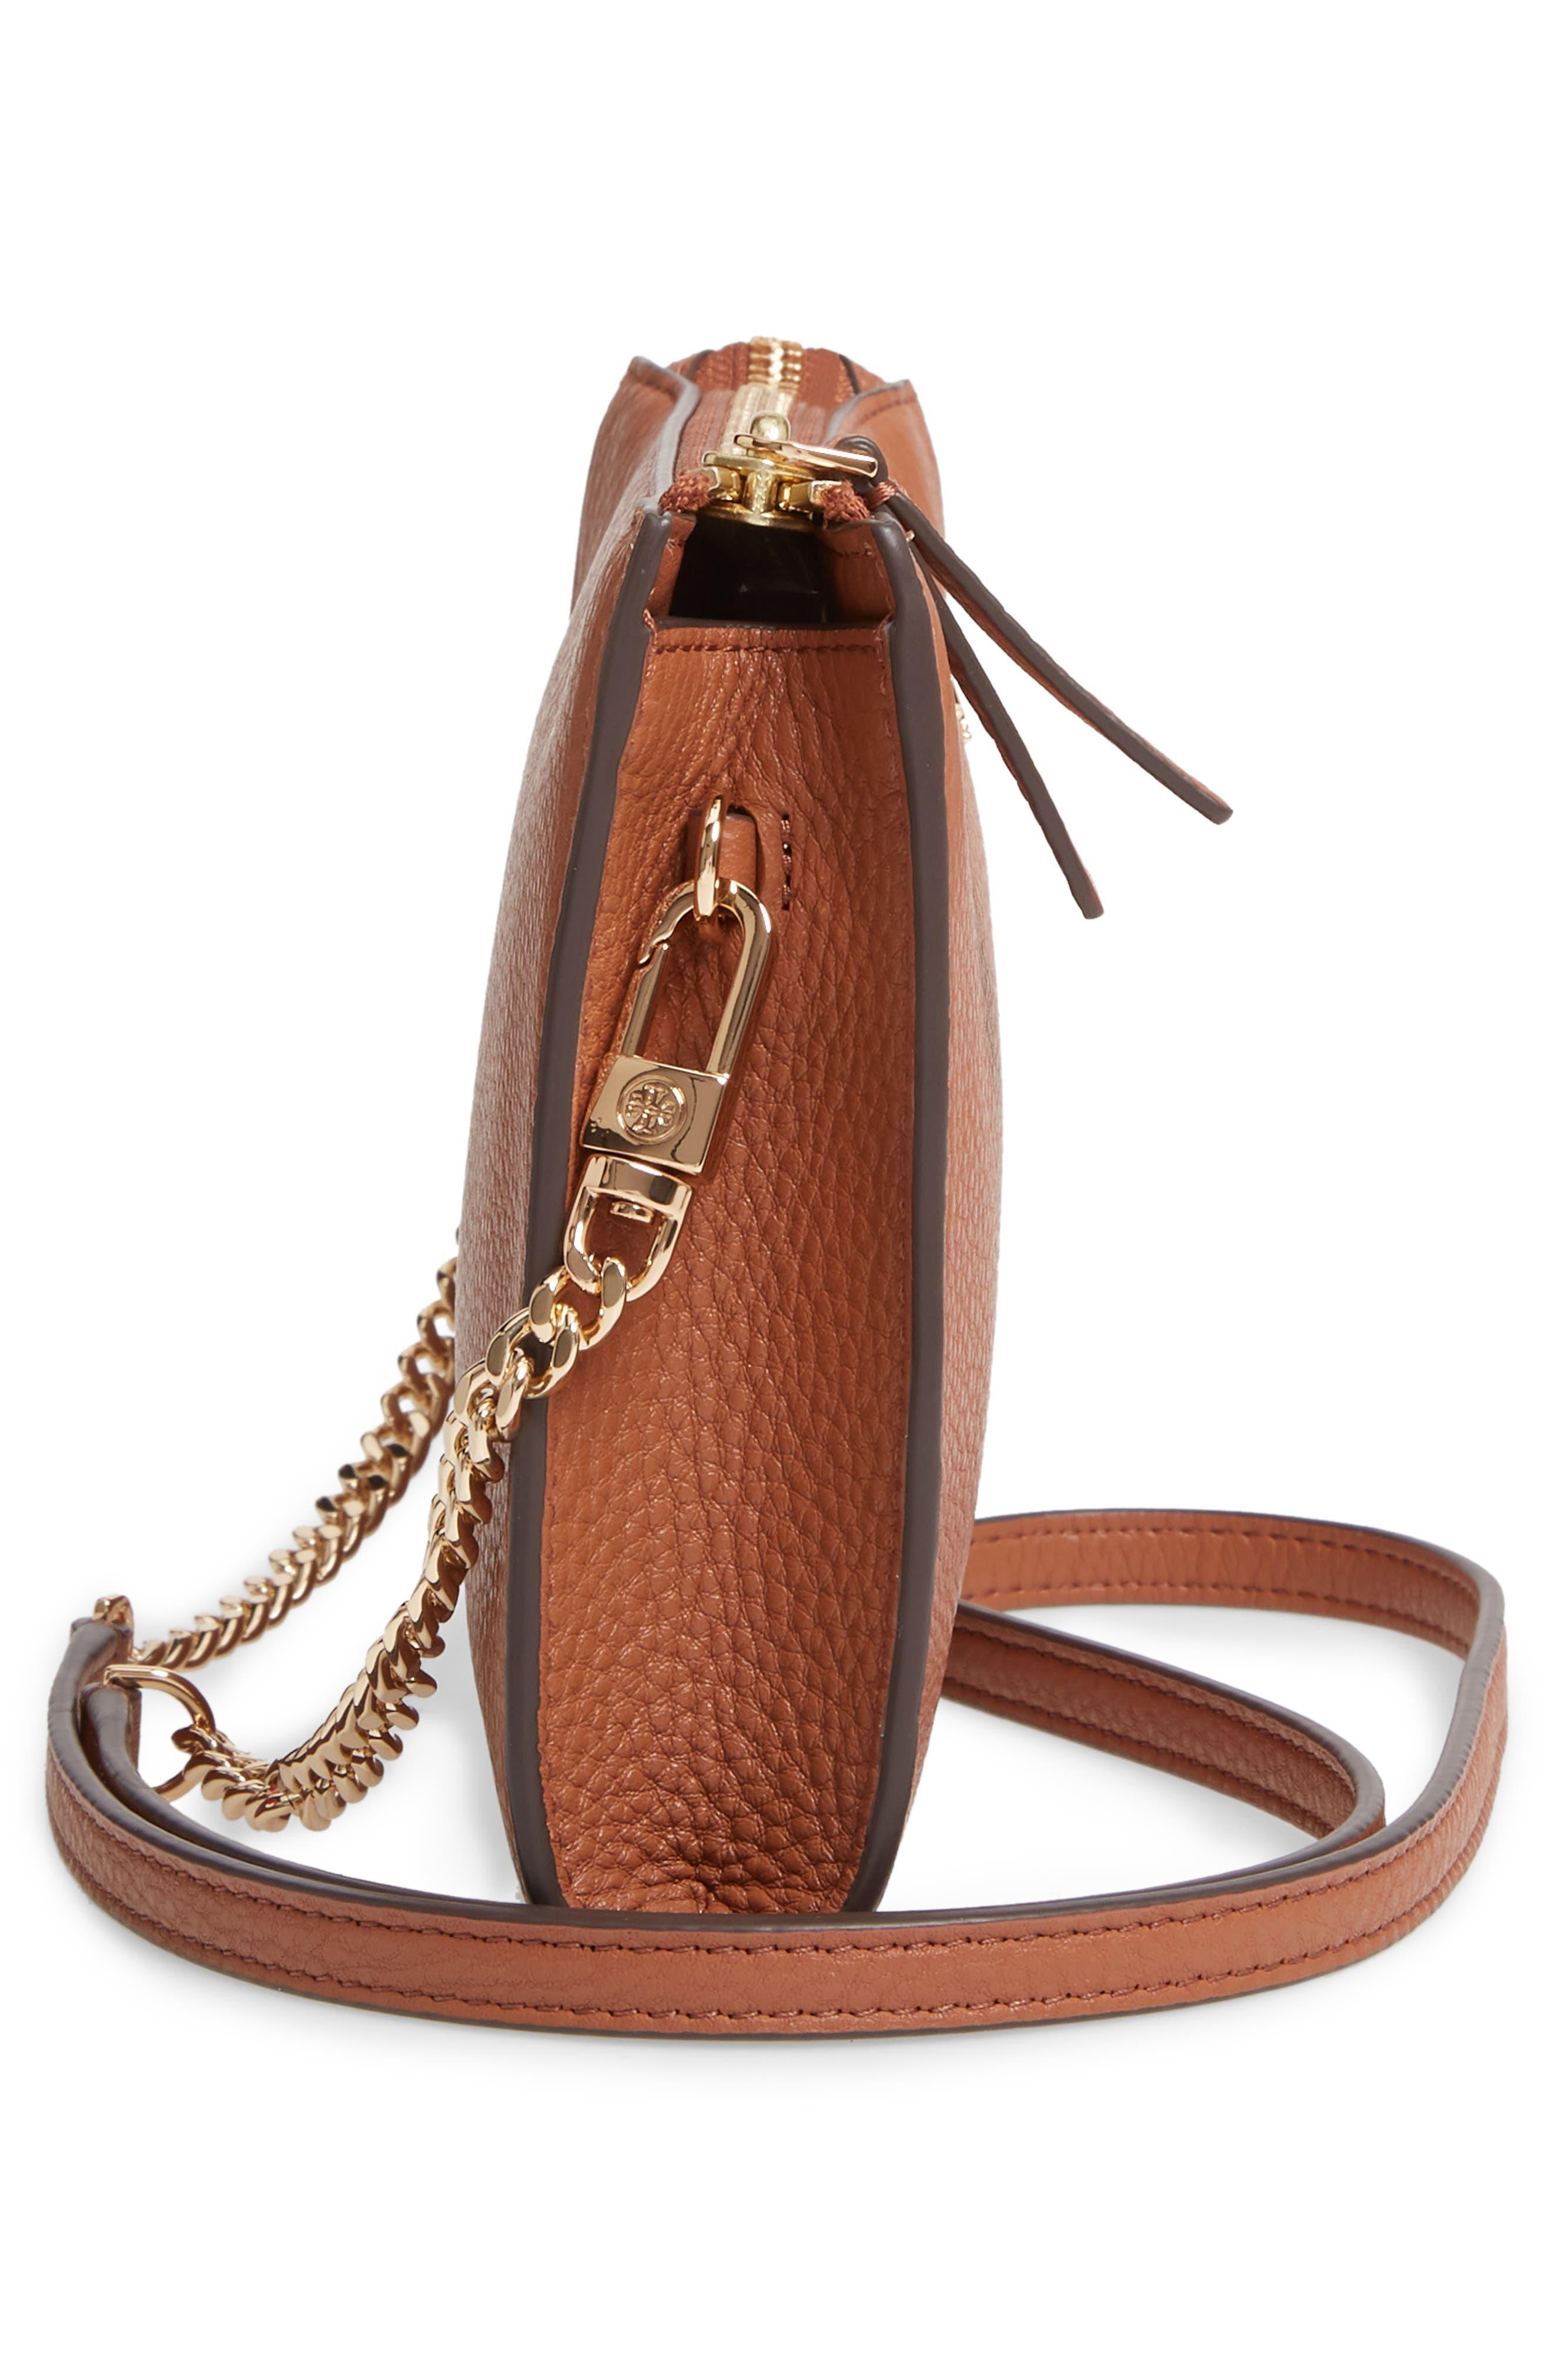 TORY BURCH,                             Pebbled Leather Top Zip Crossbody Bag,                             Alternate thumbnail 5, color,                             CLASSIC TAN